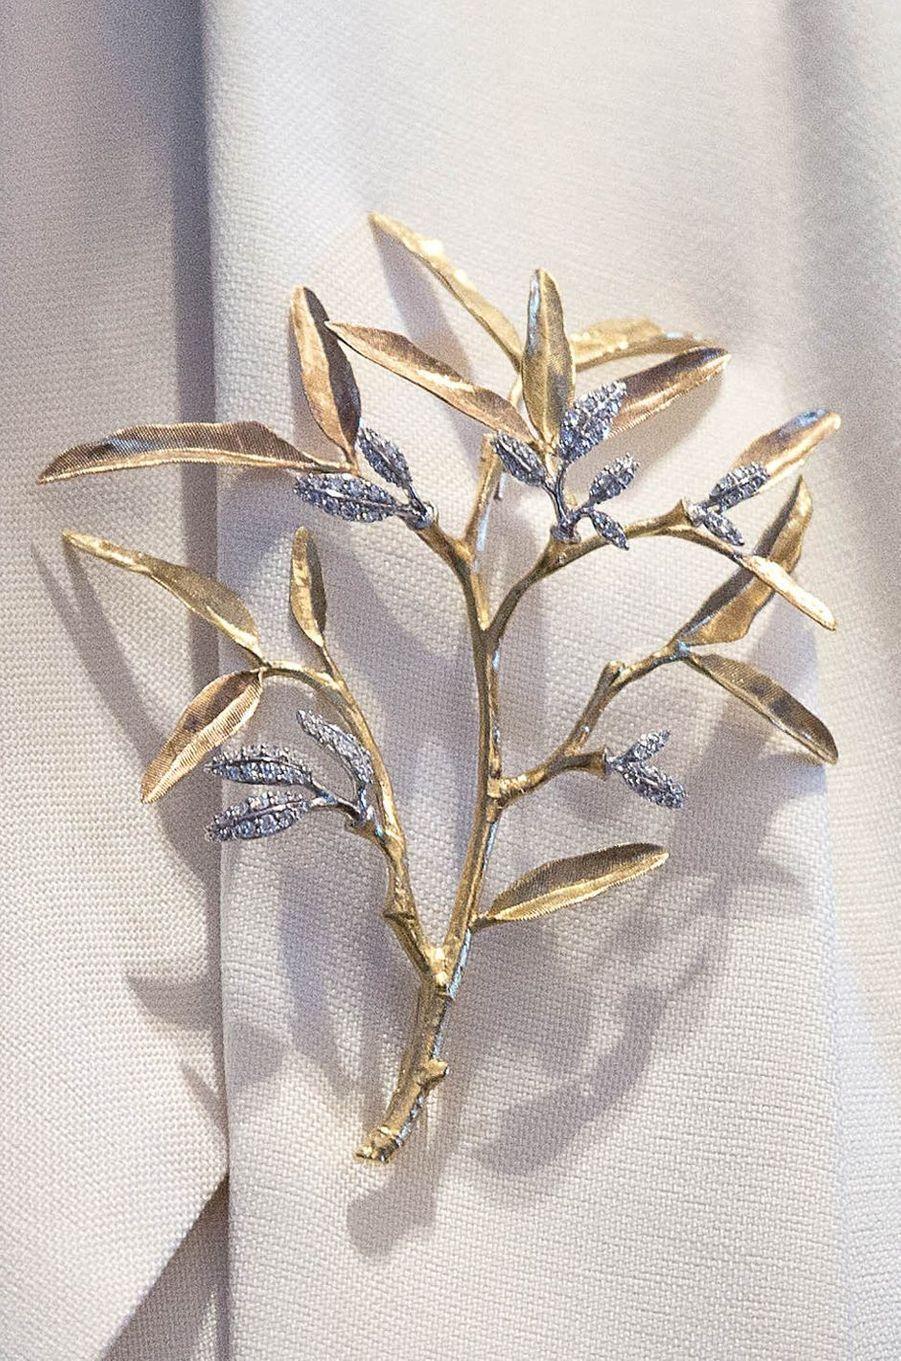 La broche de la princesse Mary de Danemark le 29 mai 2017